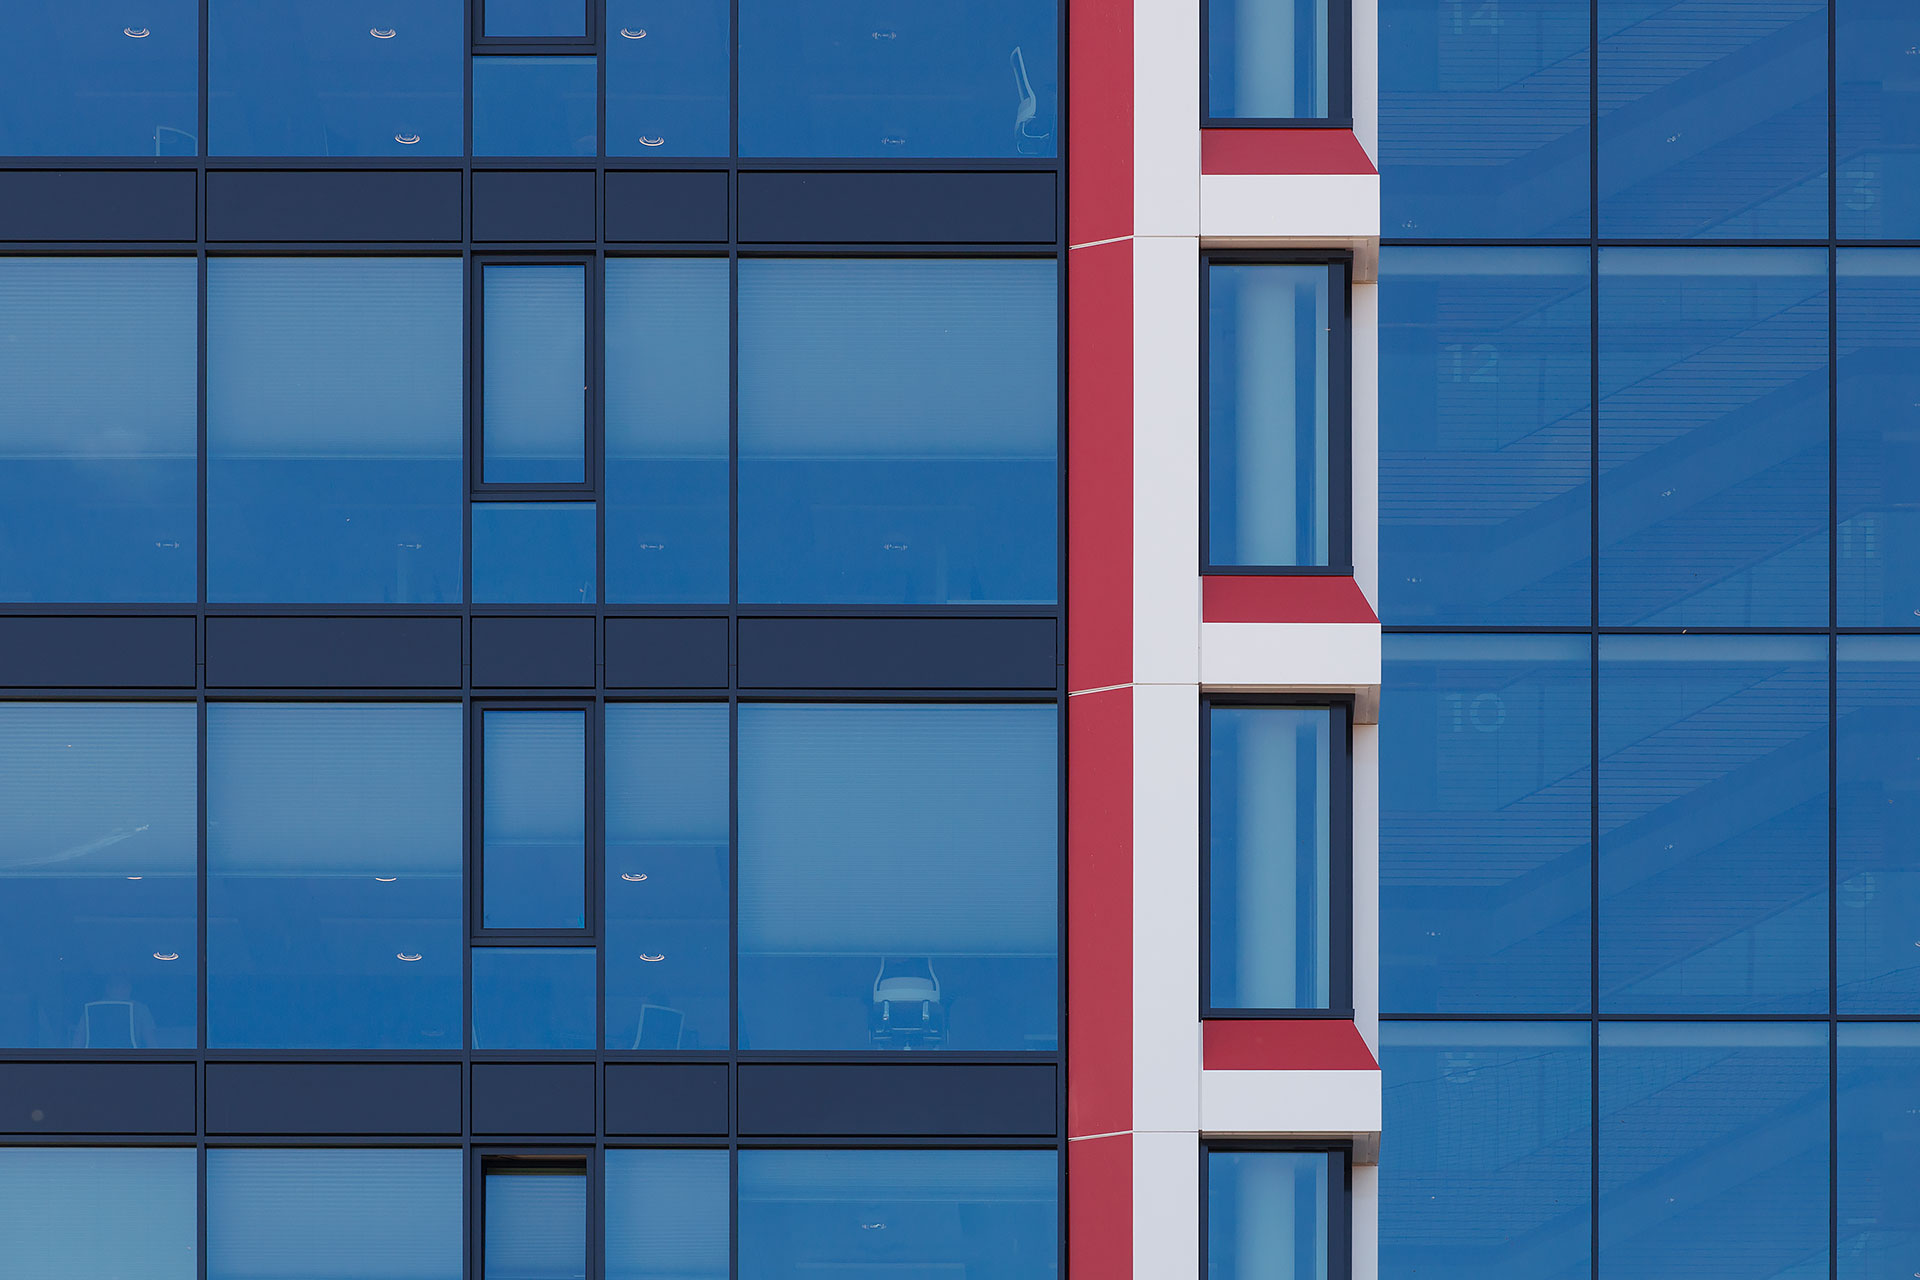 SP2015-Stadhuis-Almelo-architectuurfoto-08